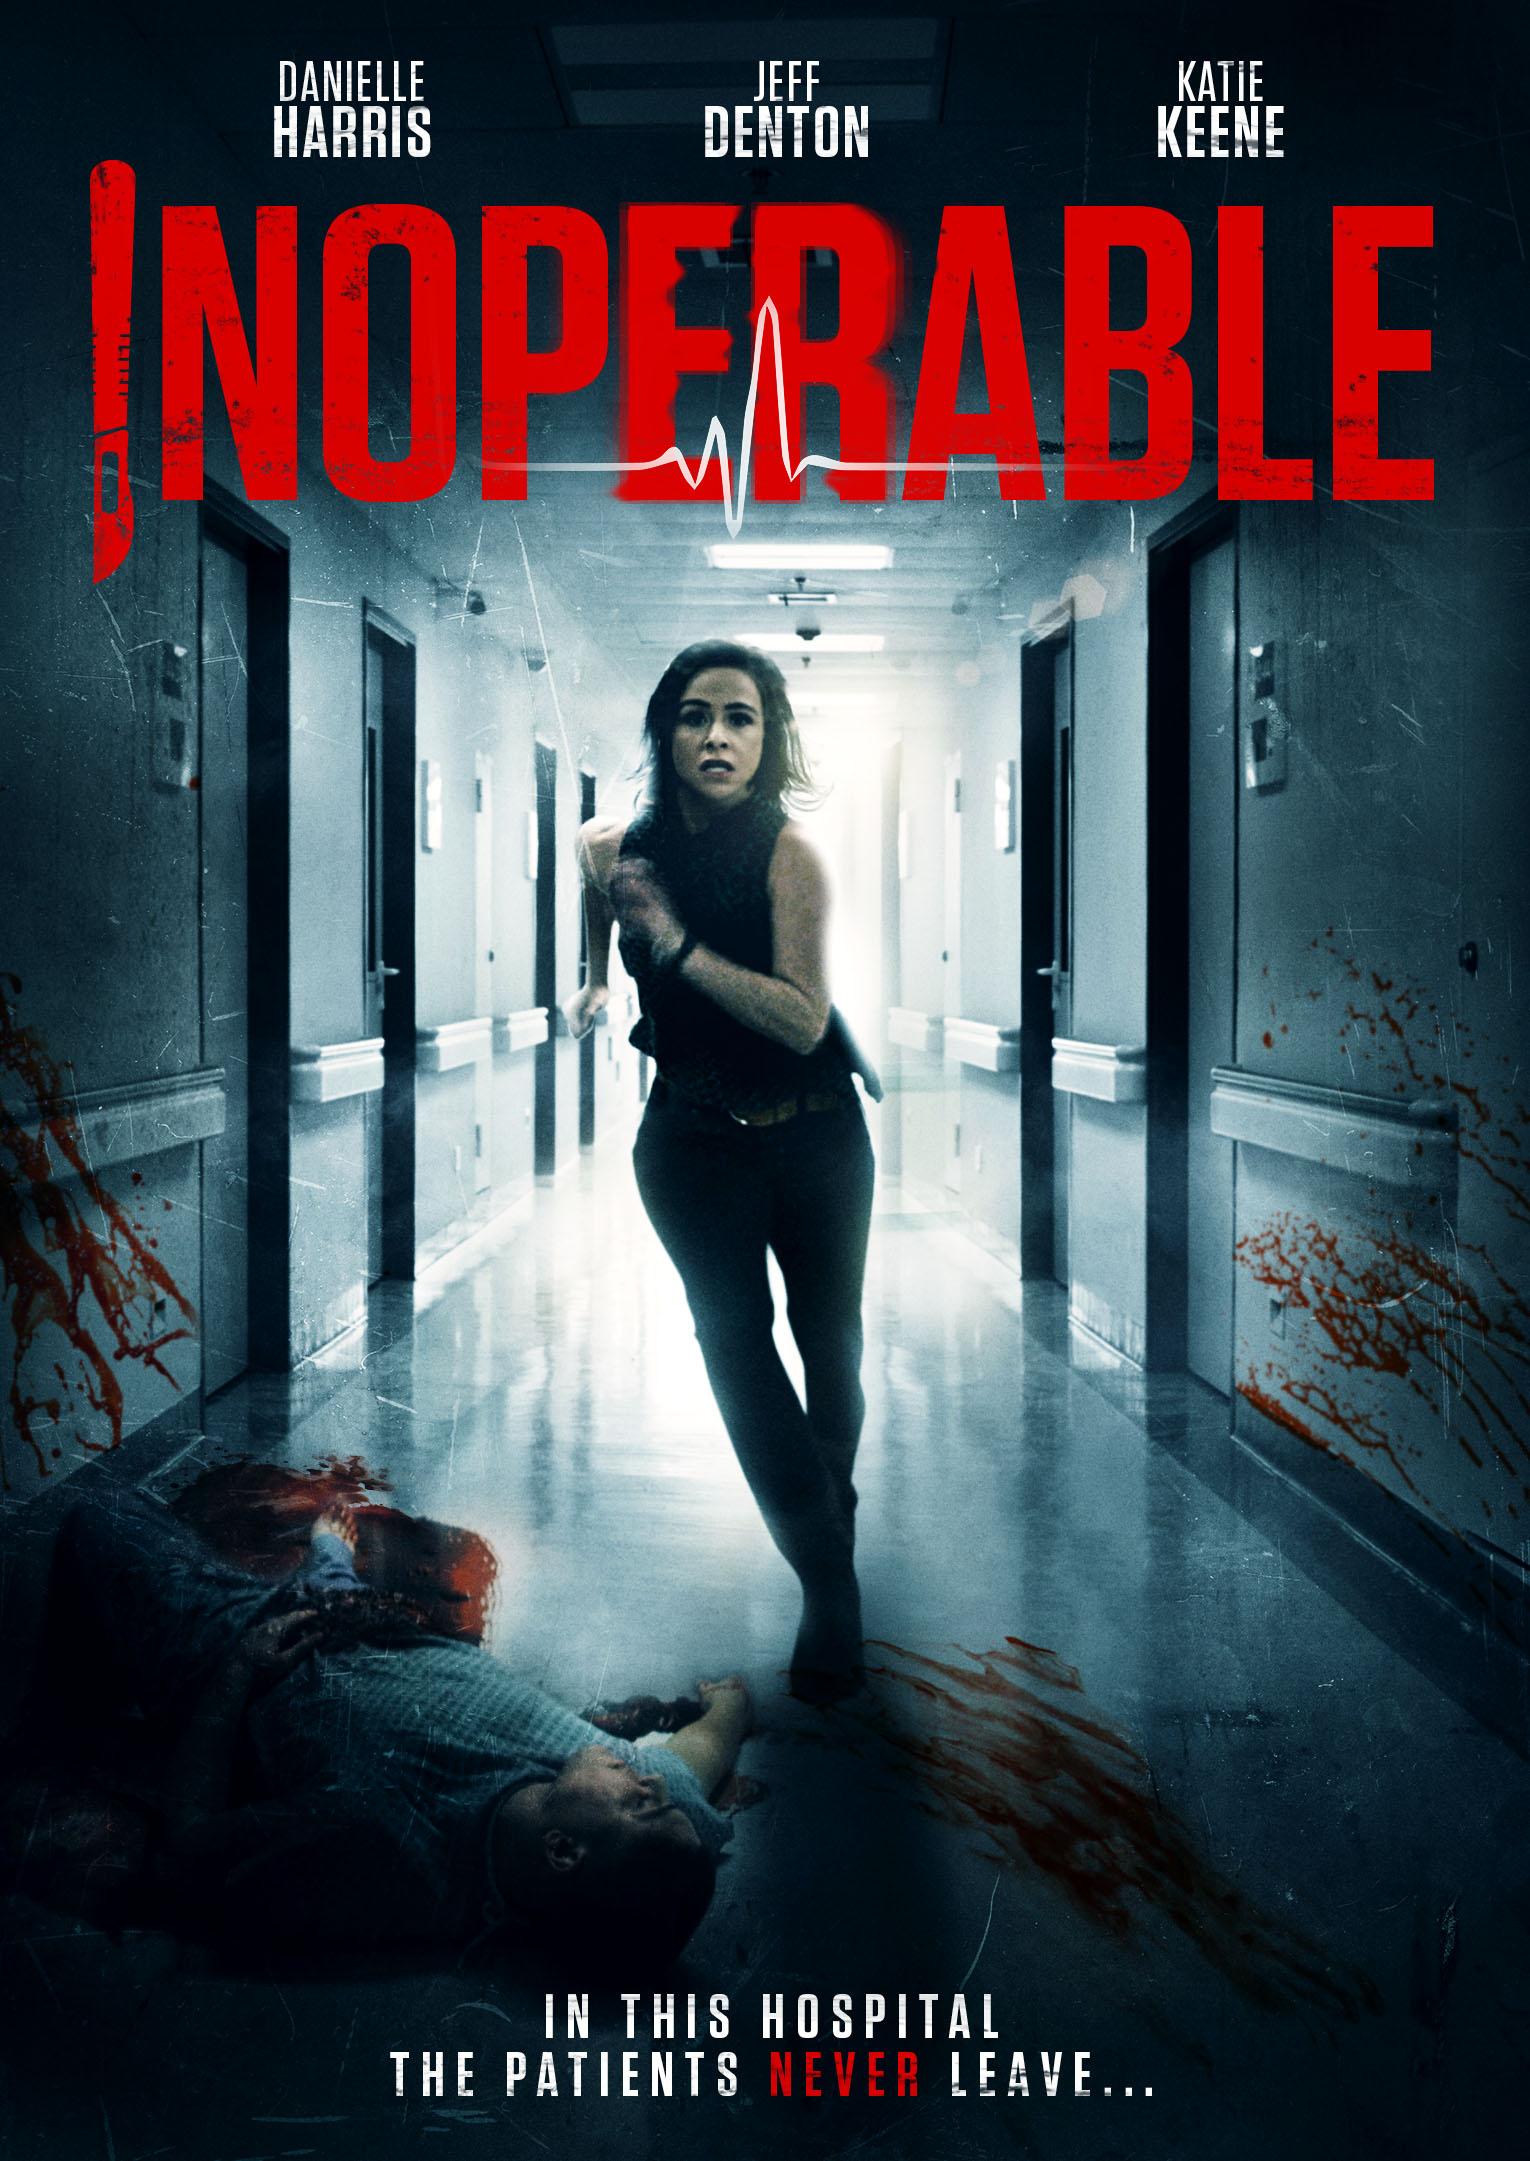 inoperable movie trailer